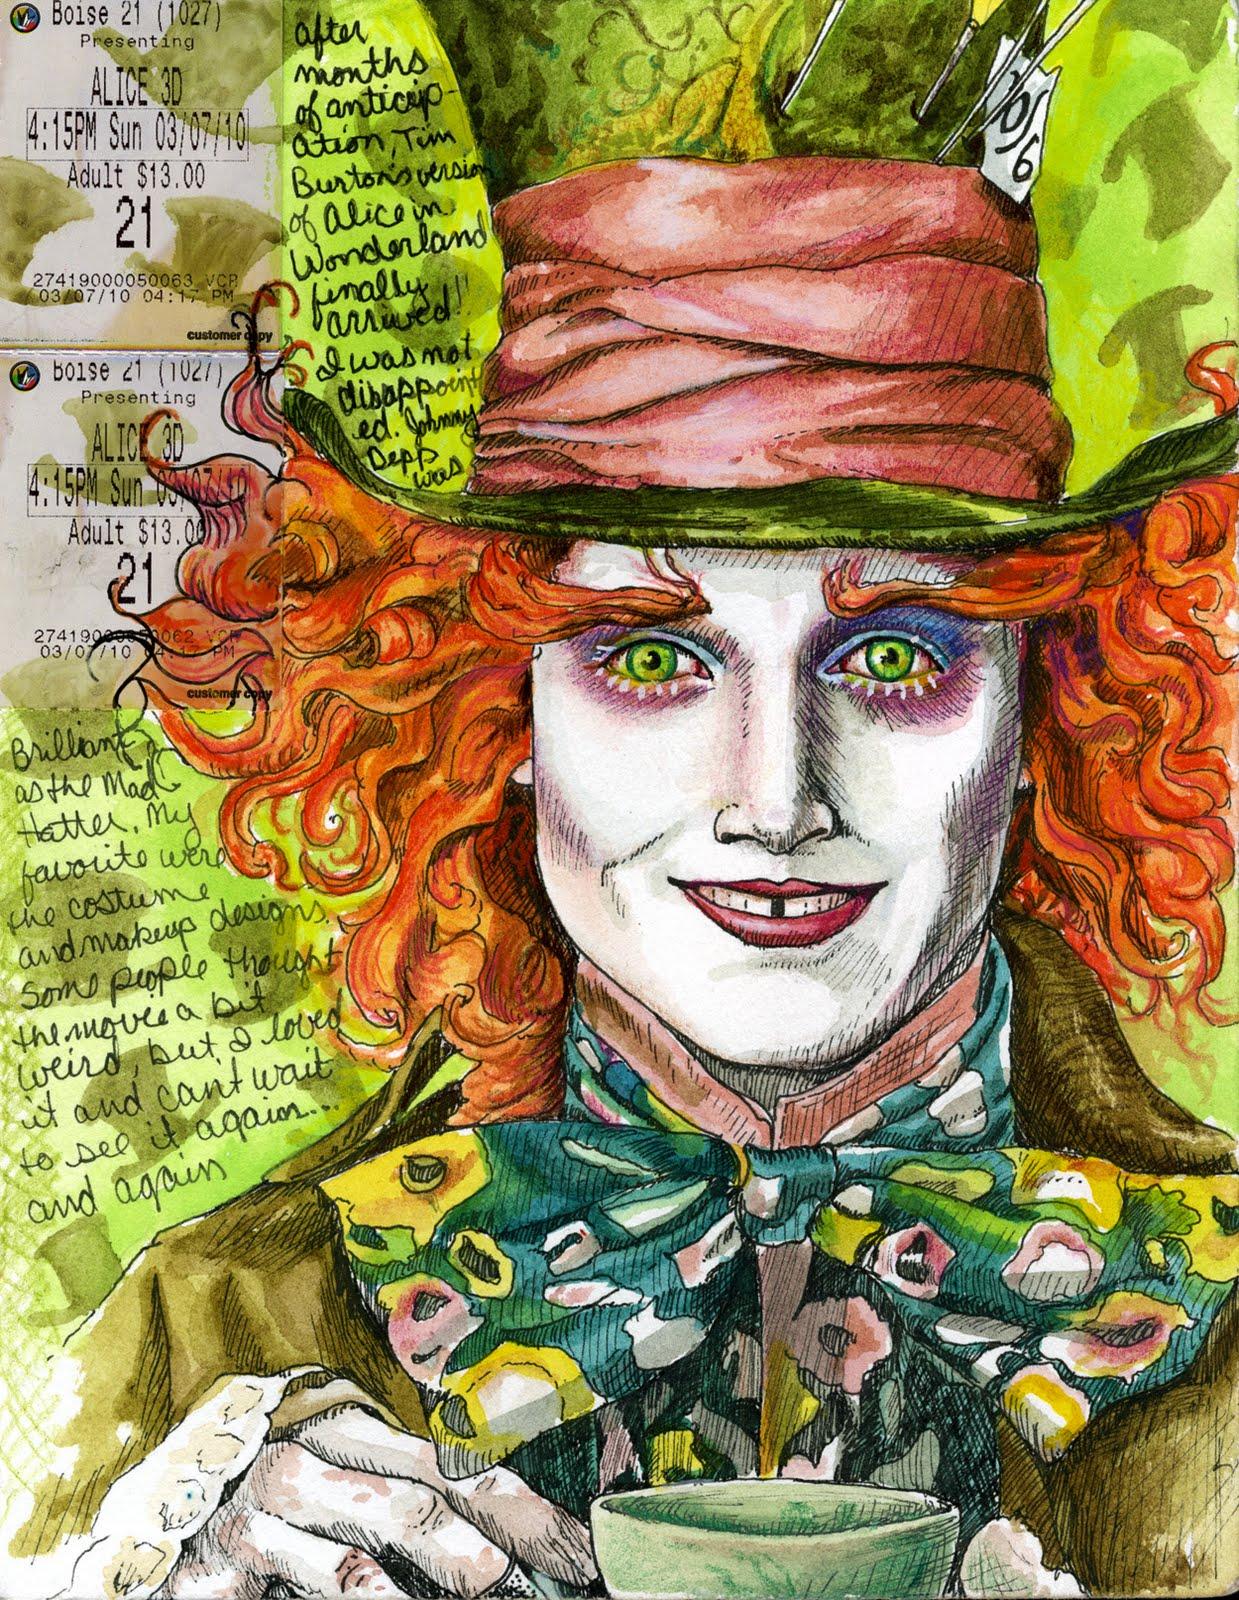 Analysis of Alice in Wonderland